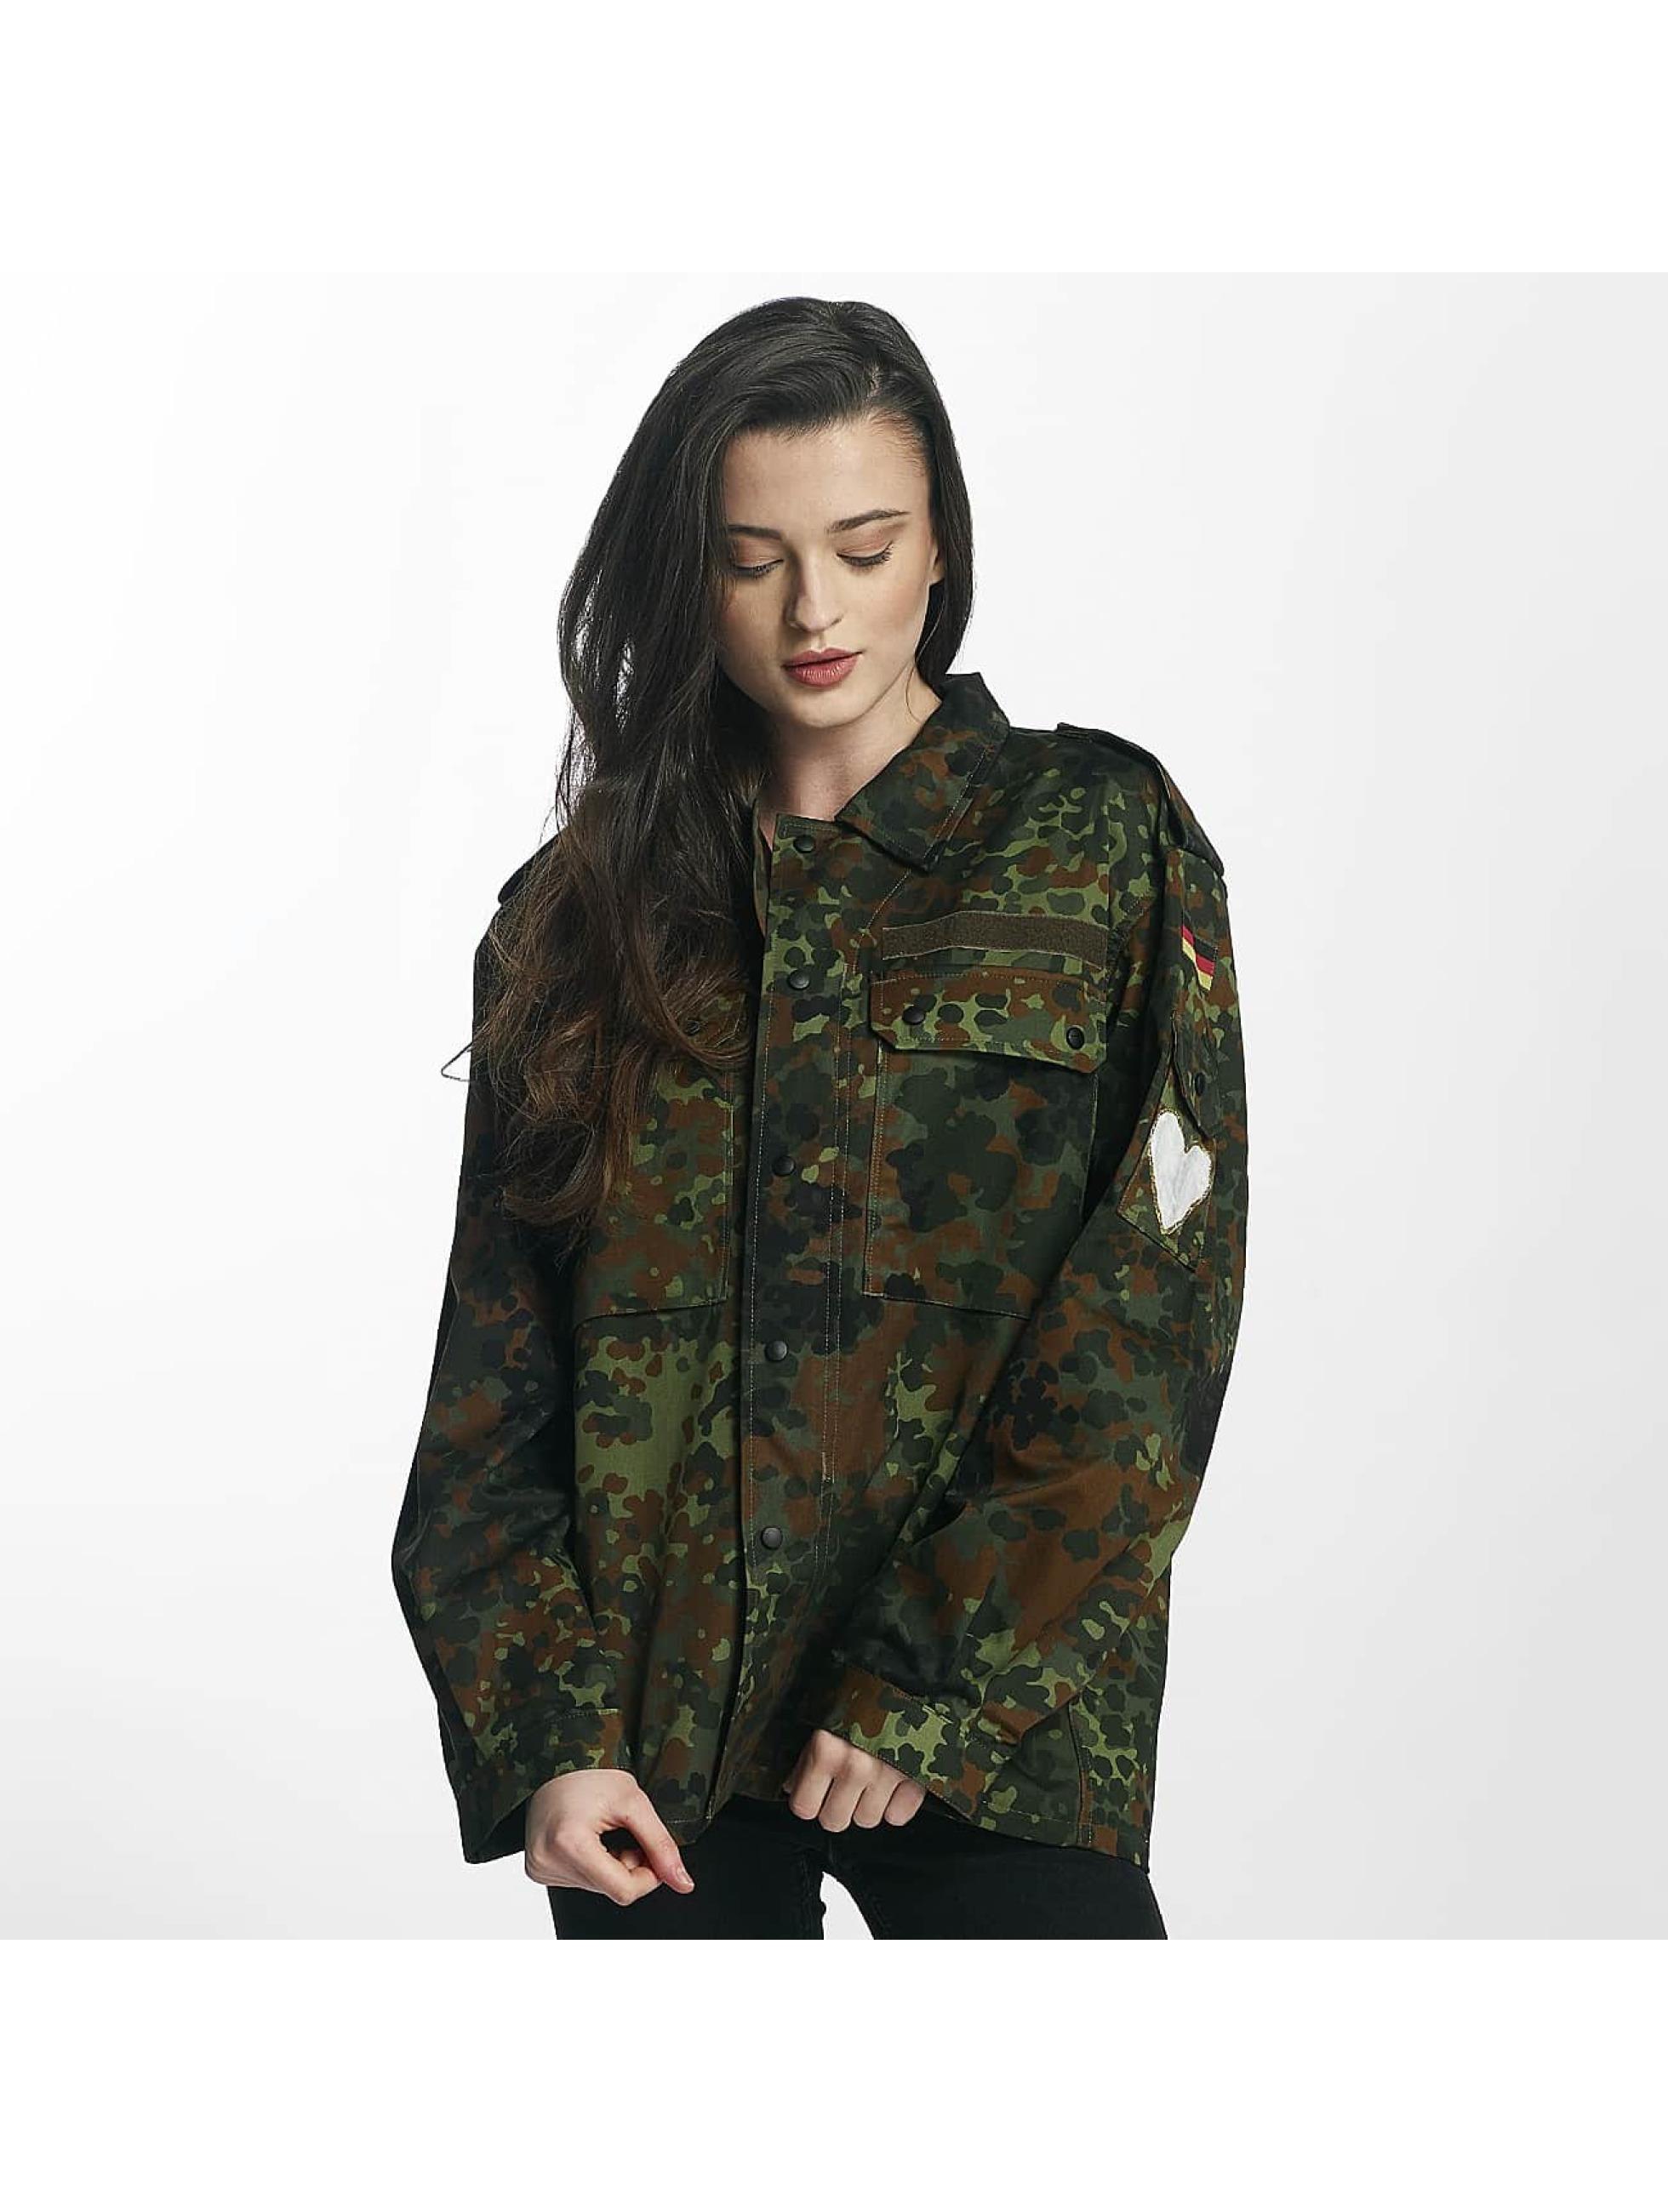 Soniush Frauen Übergangsjacke Club in camouflage